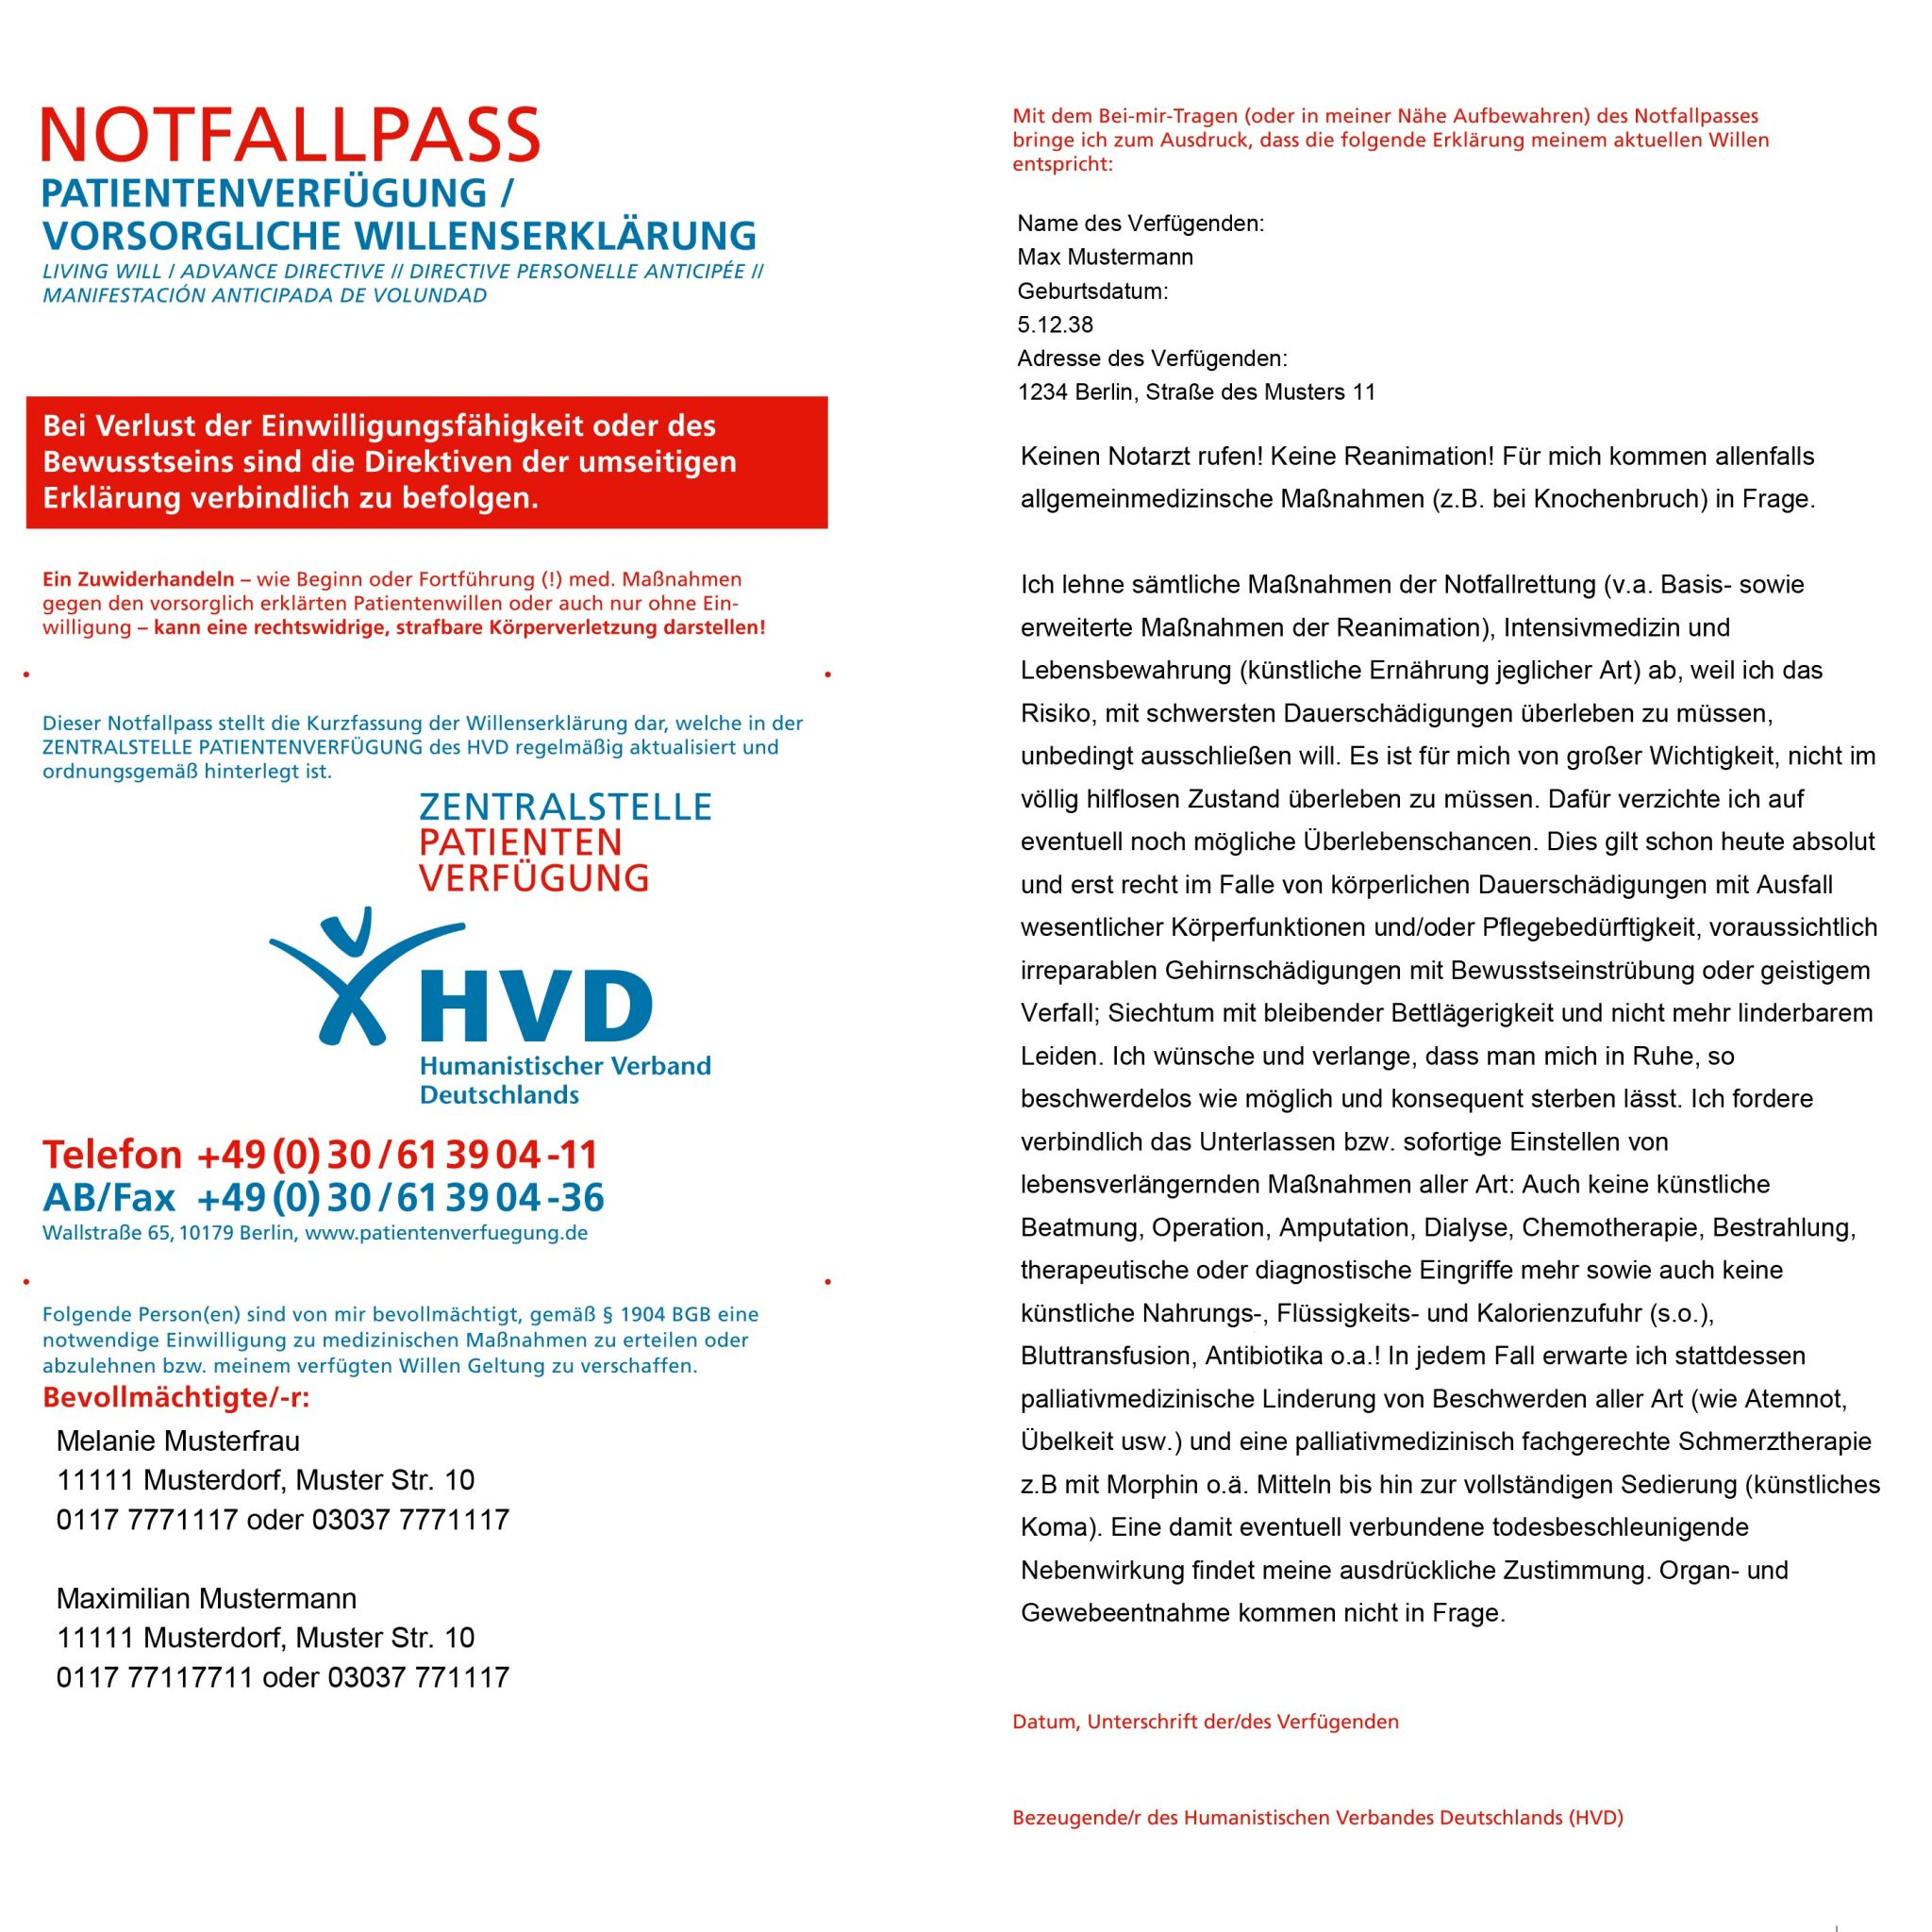 notfallpass papiermodell besser als digitale lsung hvd zentralstelle patientenverfgung - Patientenverfugung Beispiel